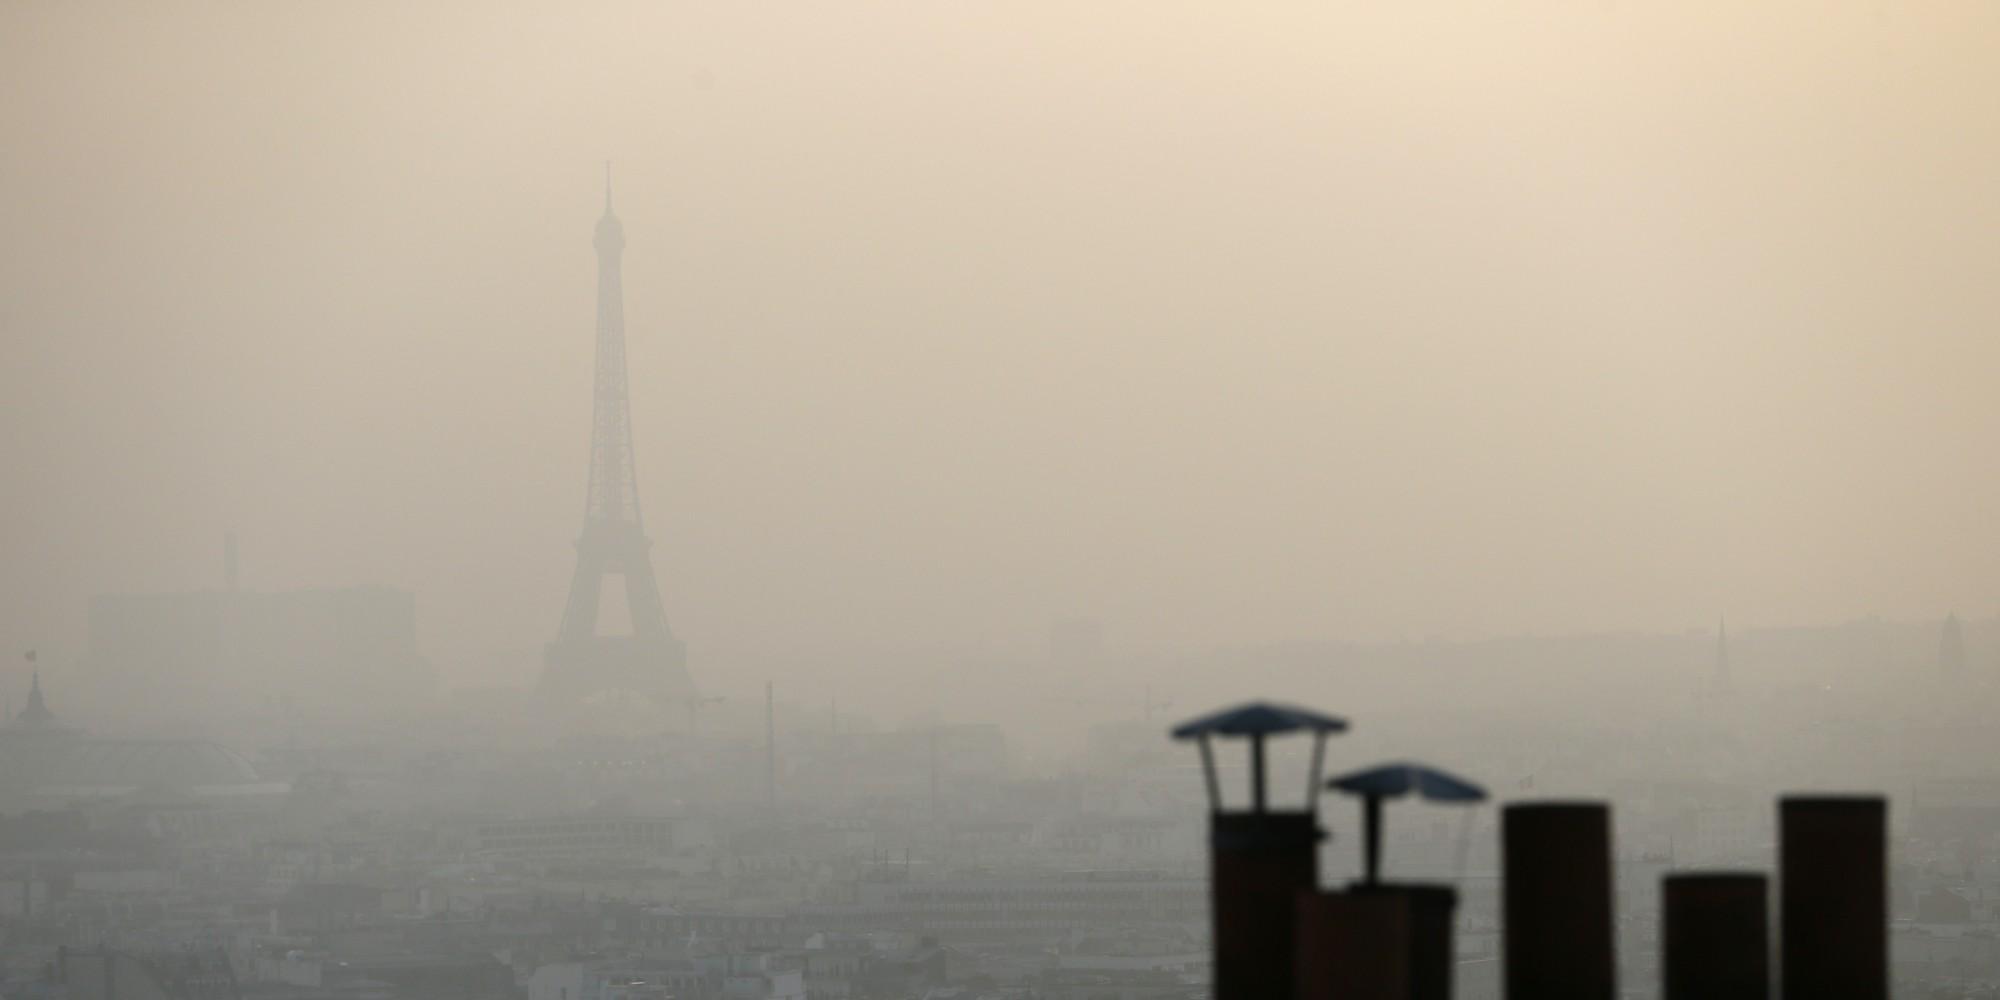 FRANCE-PARIS-ENVIRONMENT-TRANSPORT-POLLUTION